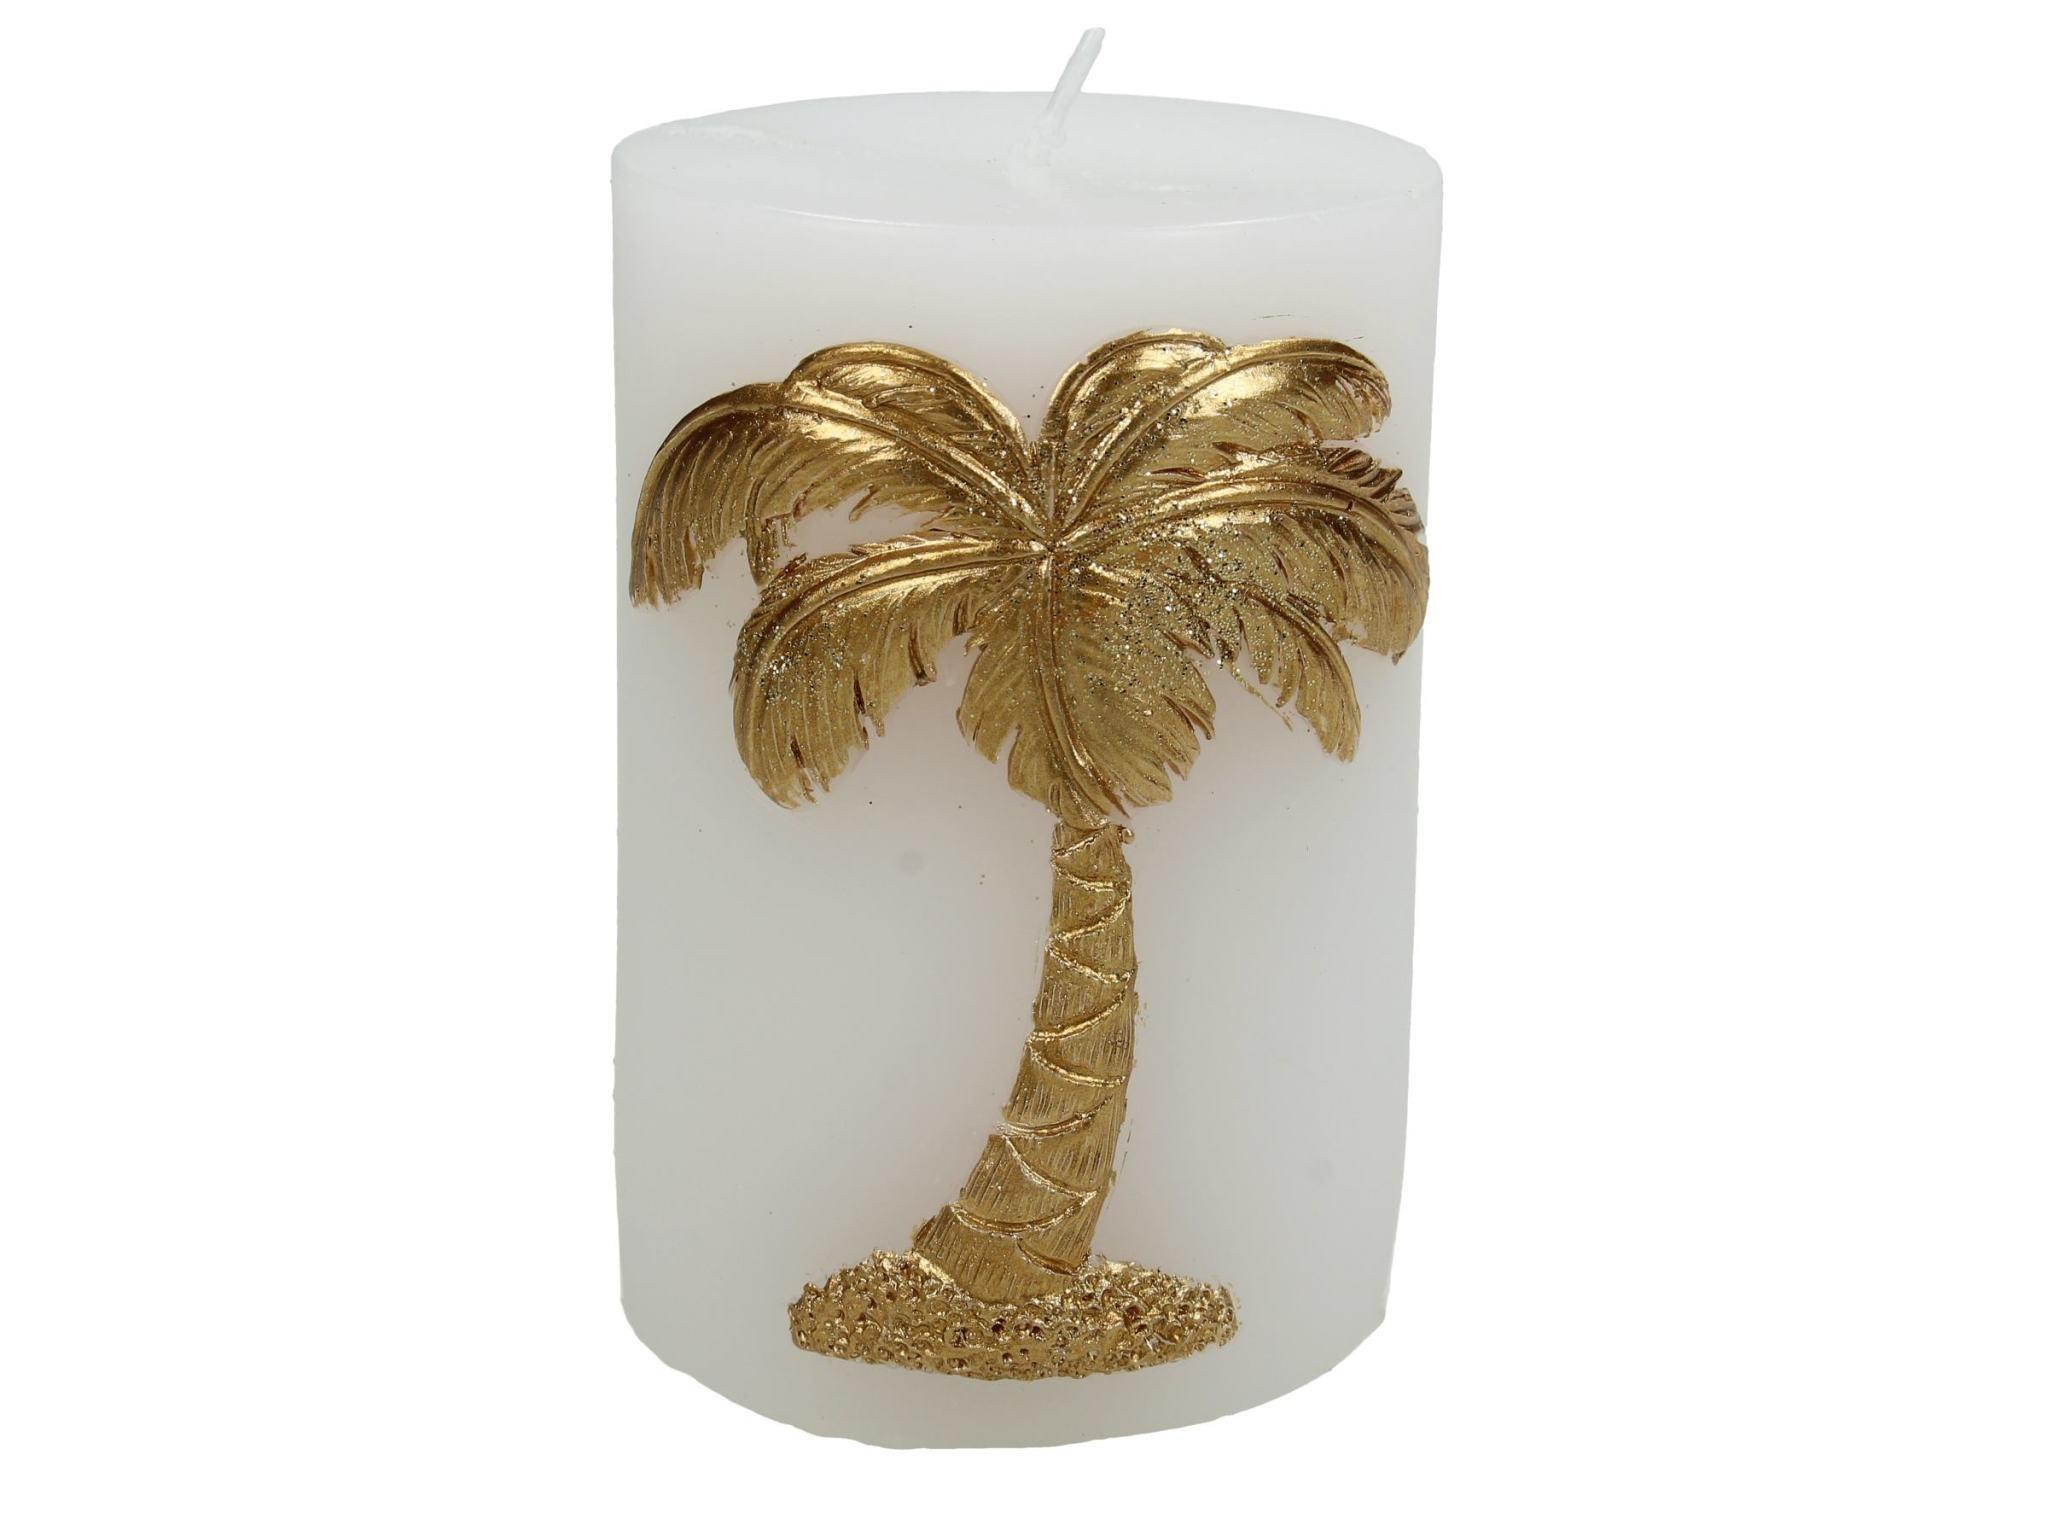 Sierkaars met Gouden Palmboom opdruk 7.3x7x10cm